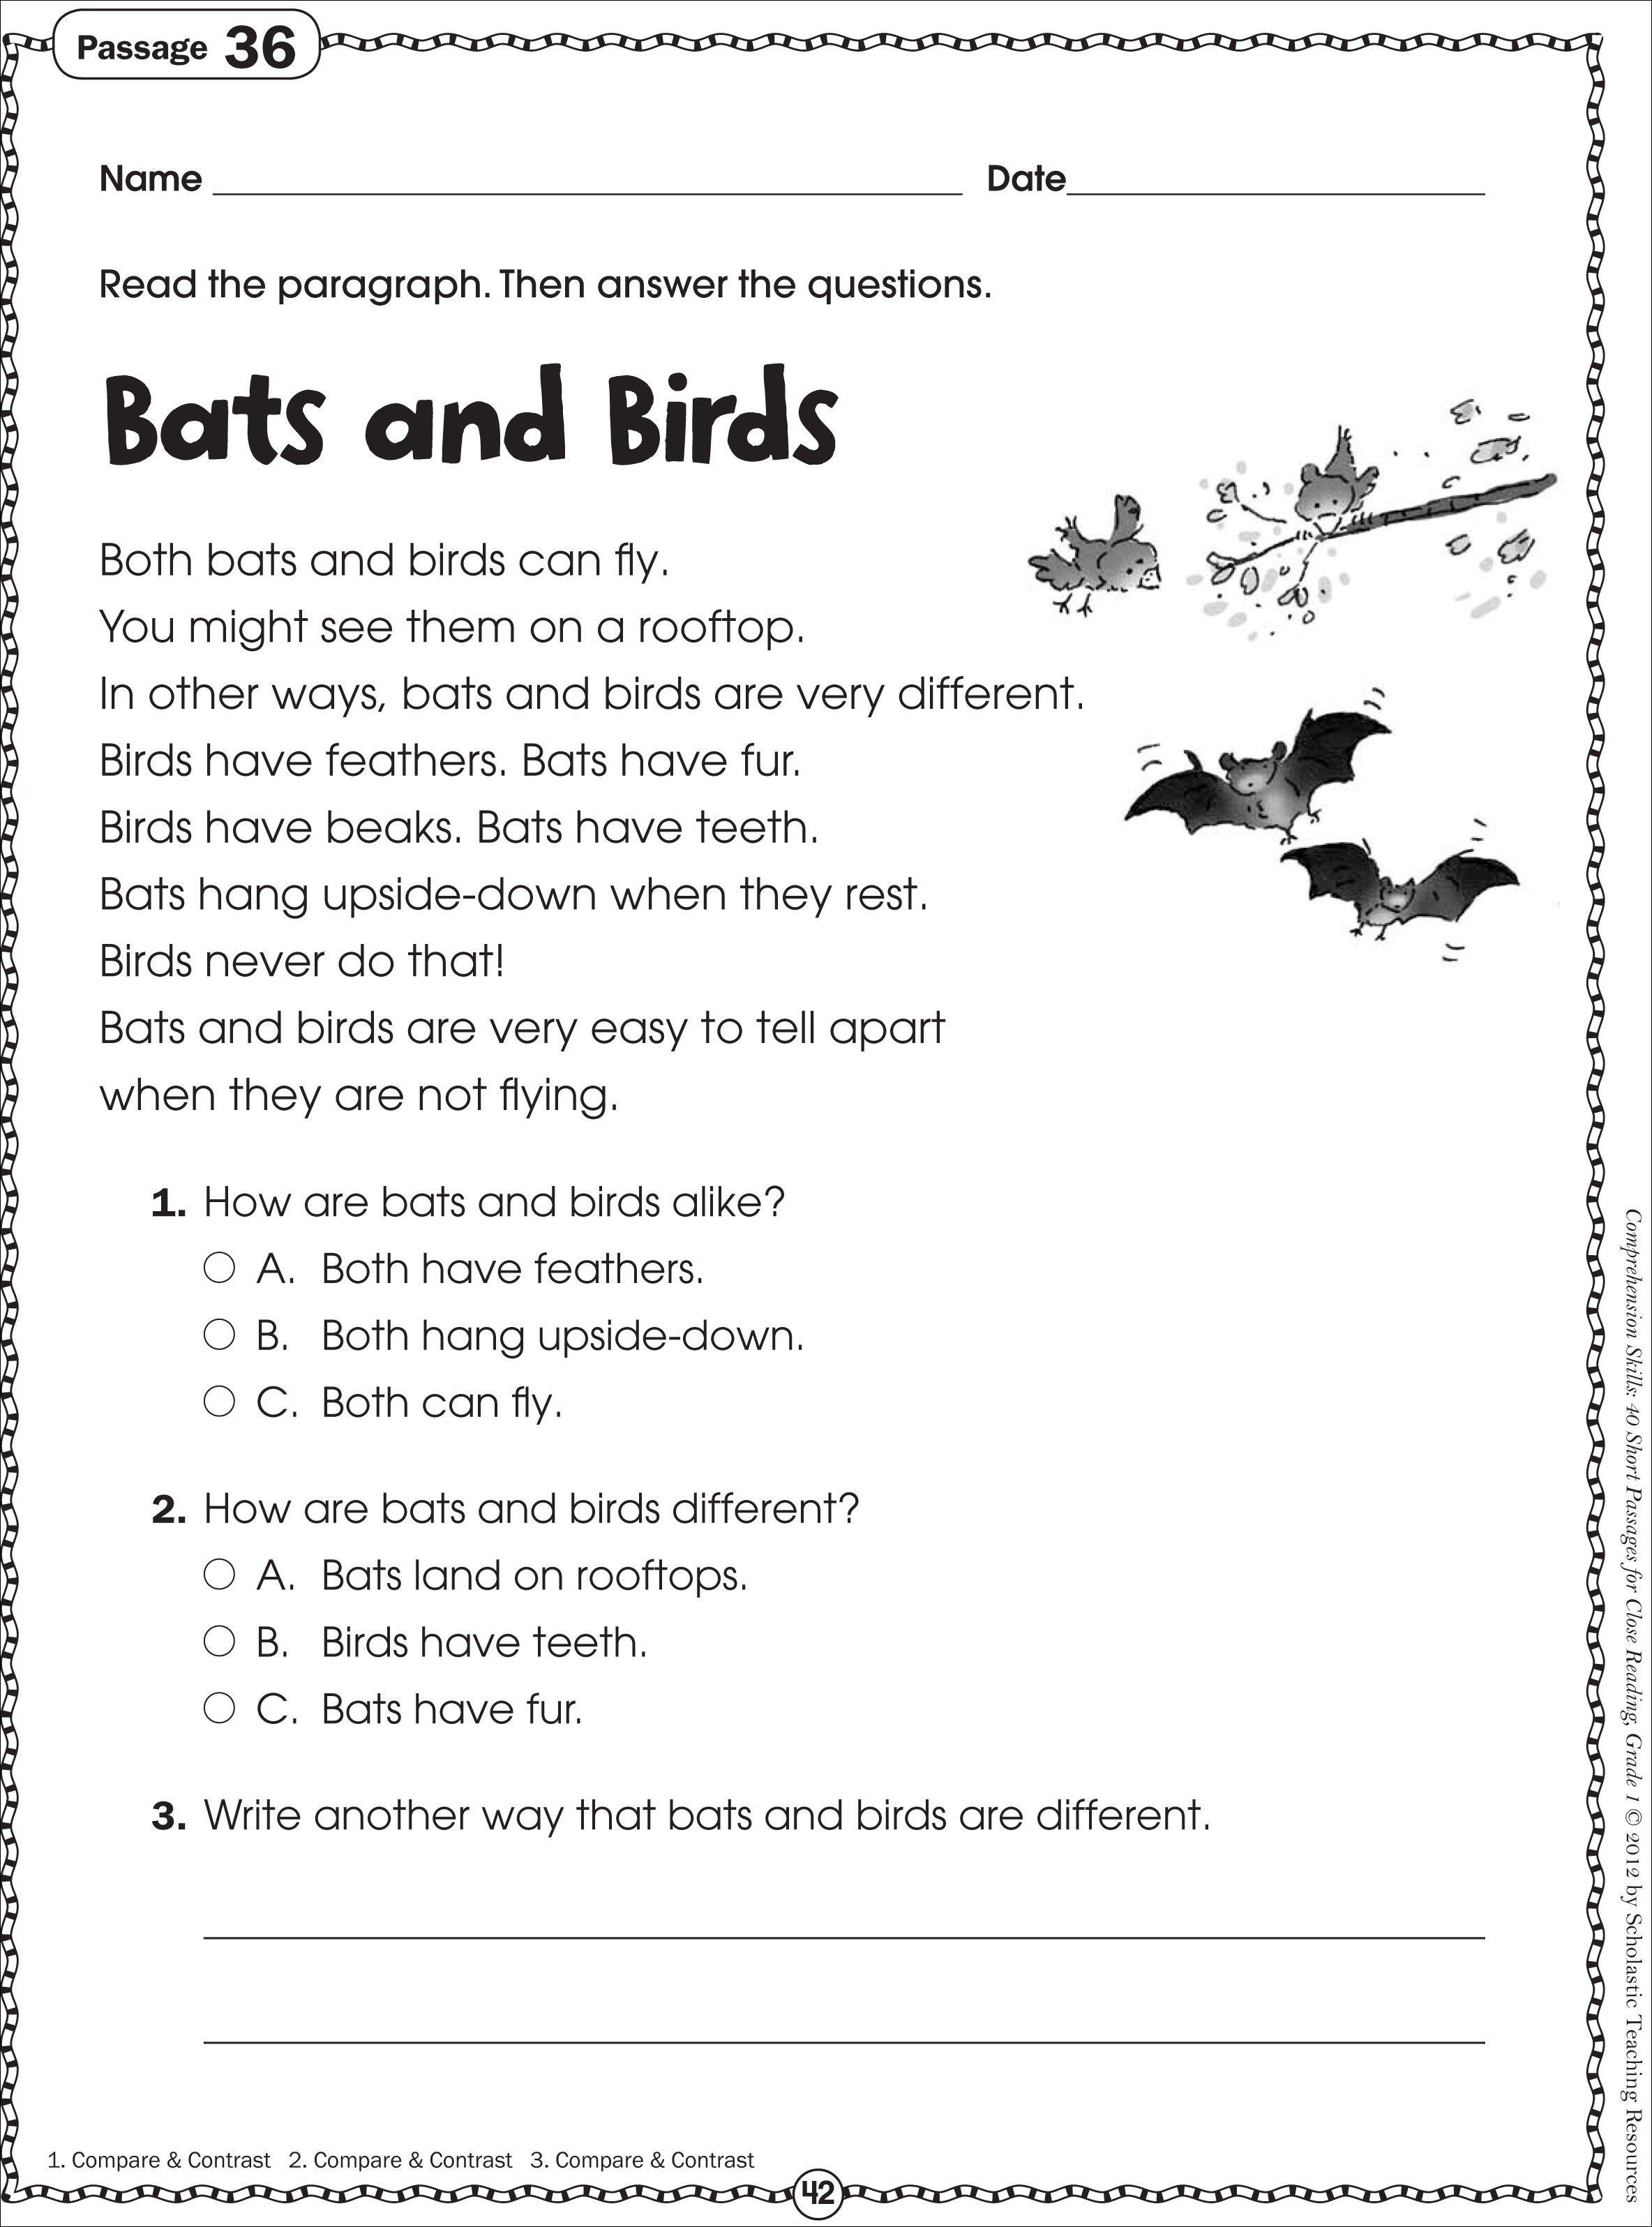 Free Printable Reading Comprehension Worksheets For Kindergarten   Free Printable Reading Comprehension Worksheets For 3Rd Grade